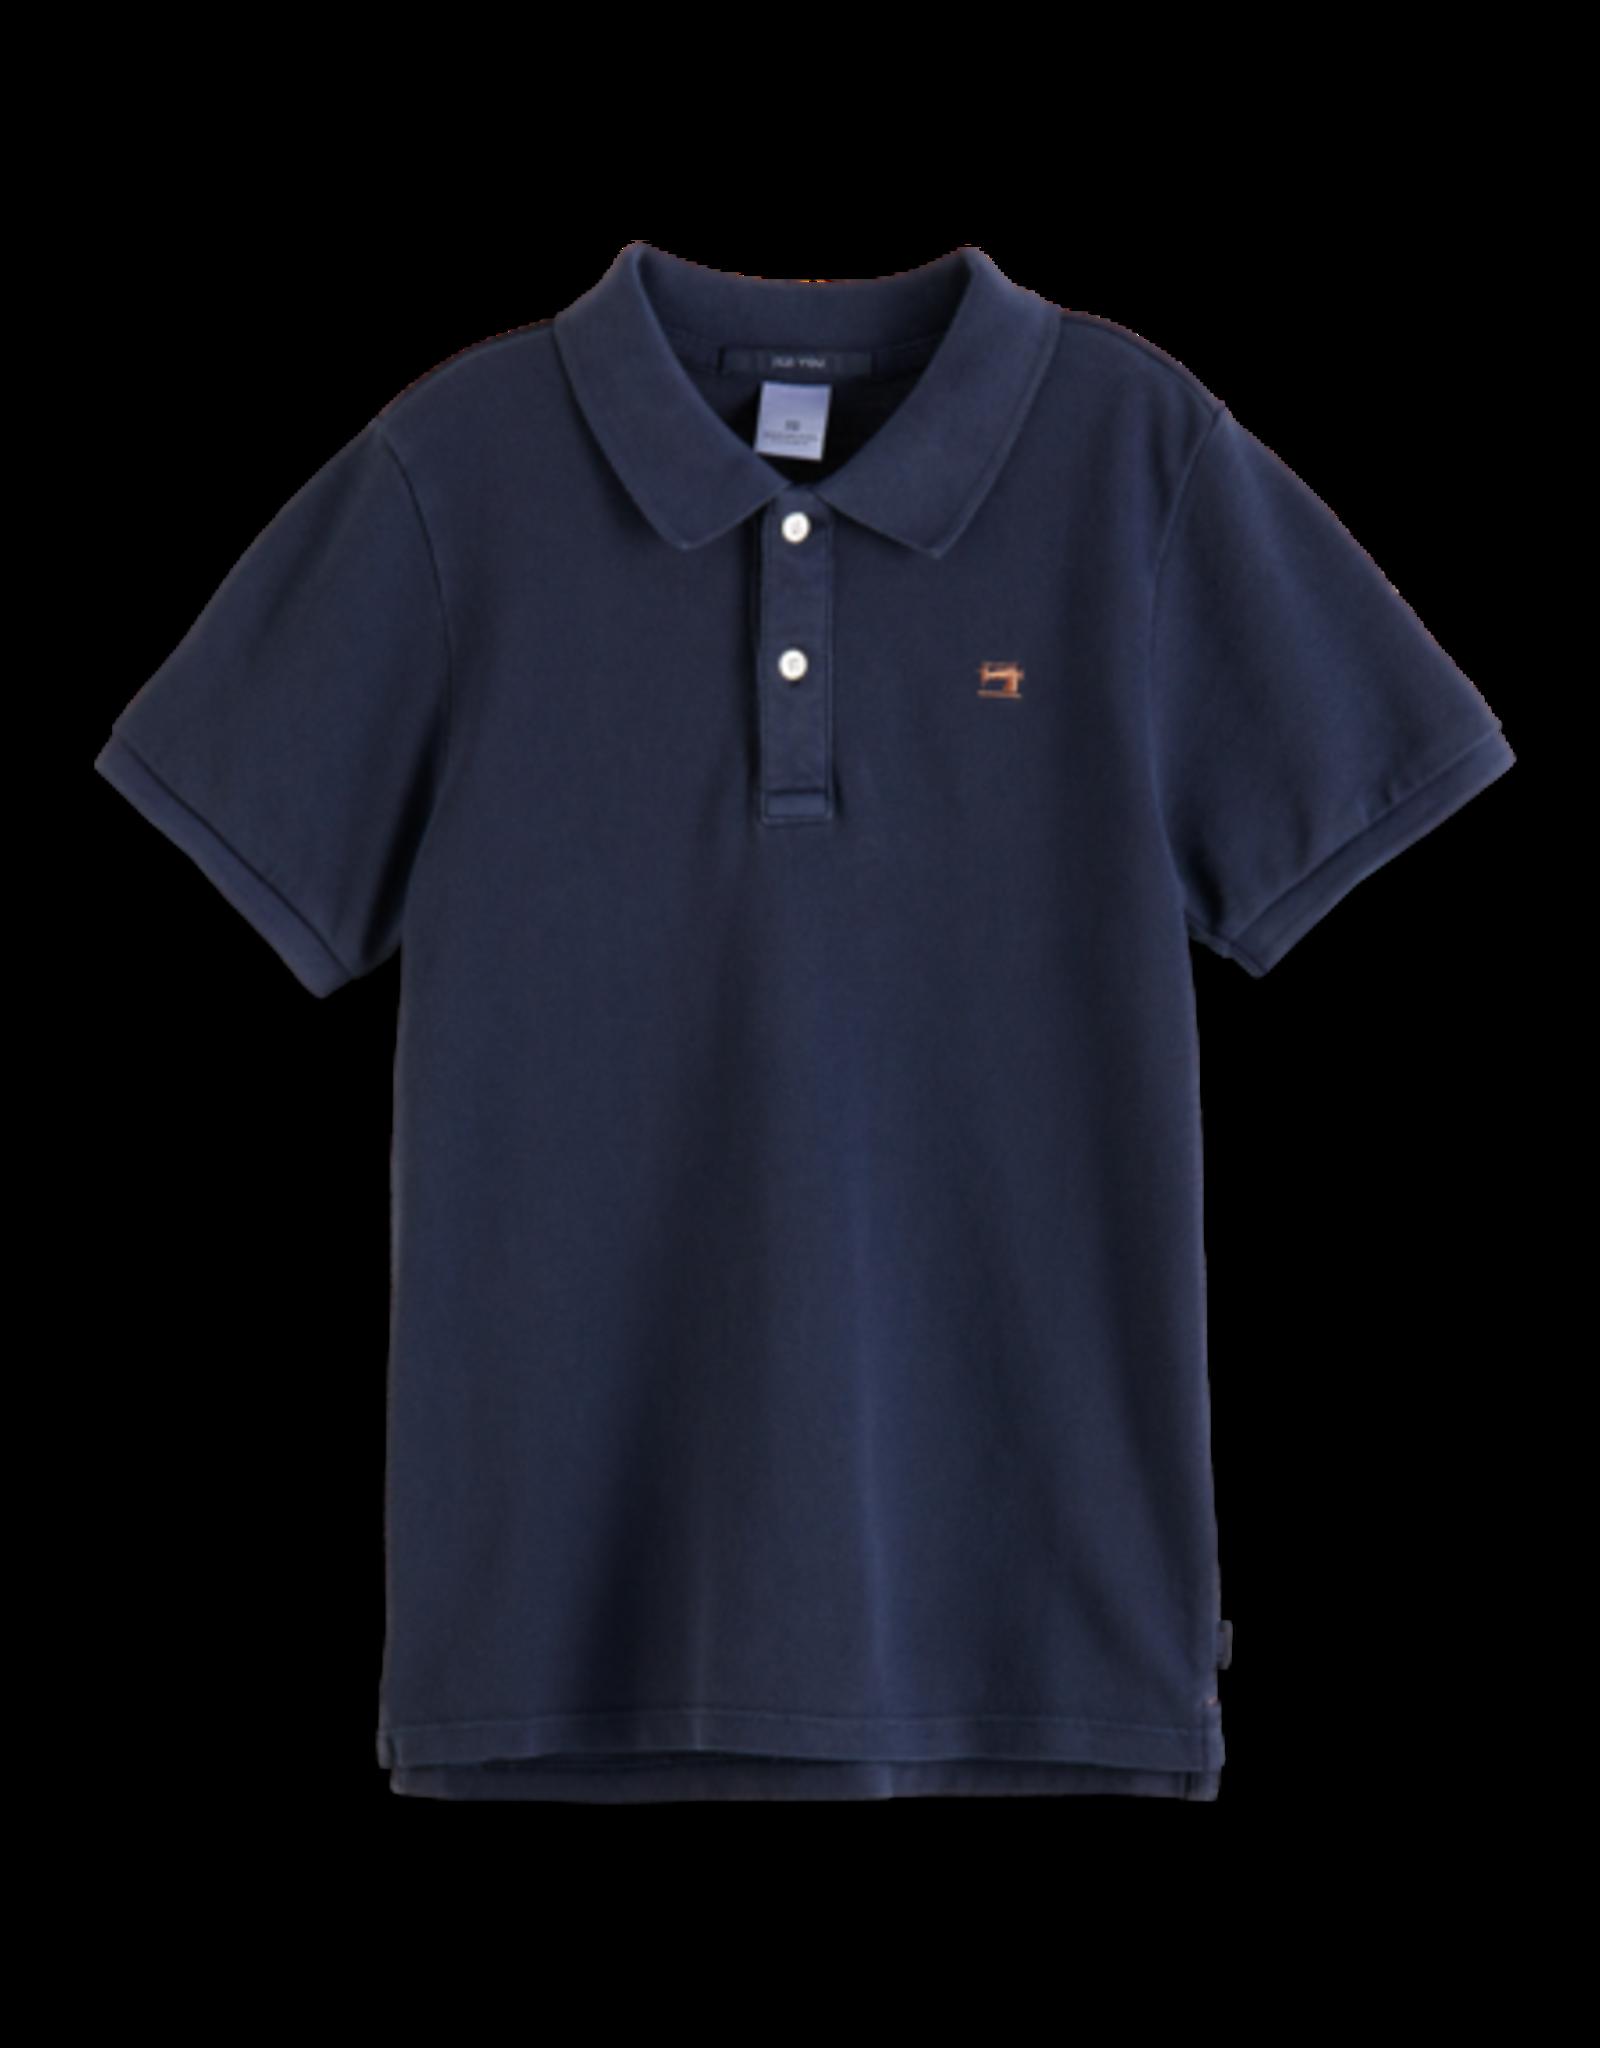 Scotch & Soda Scotch Shrunk navy polo shirt